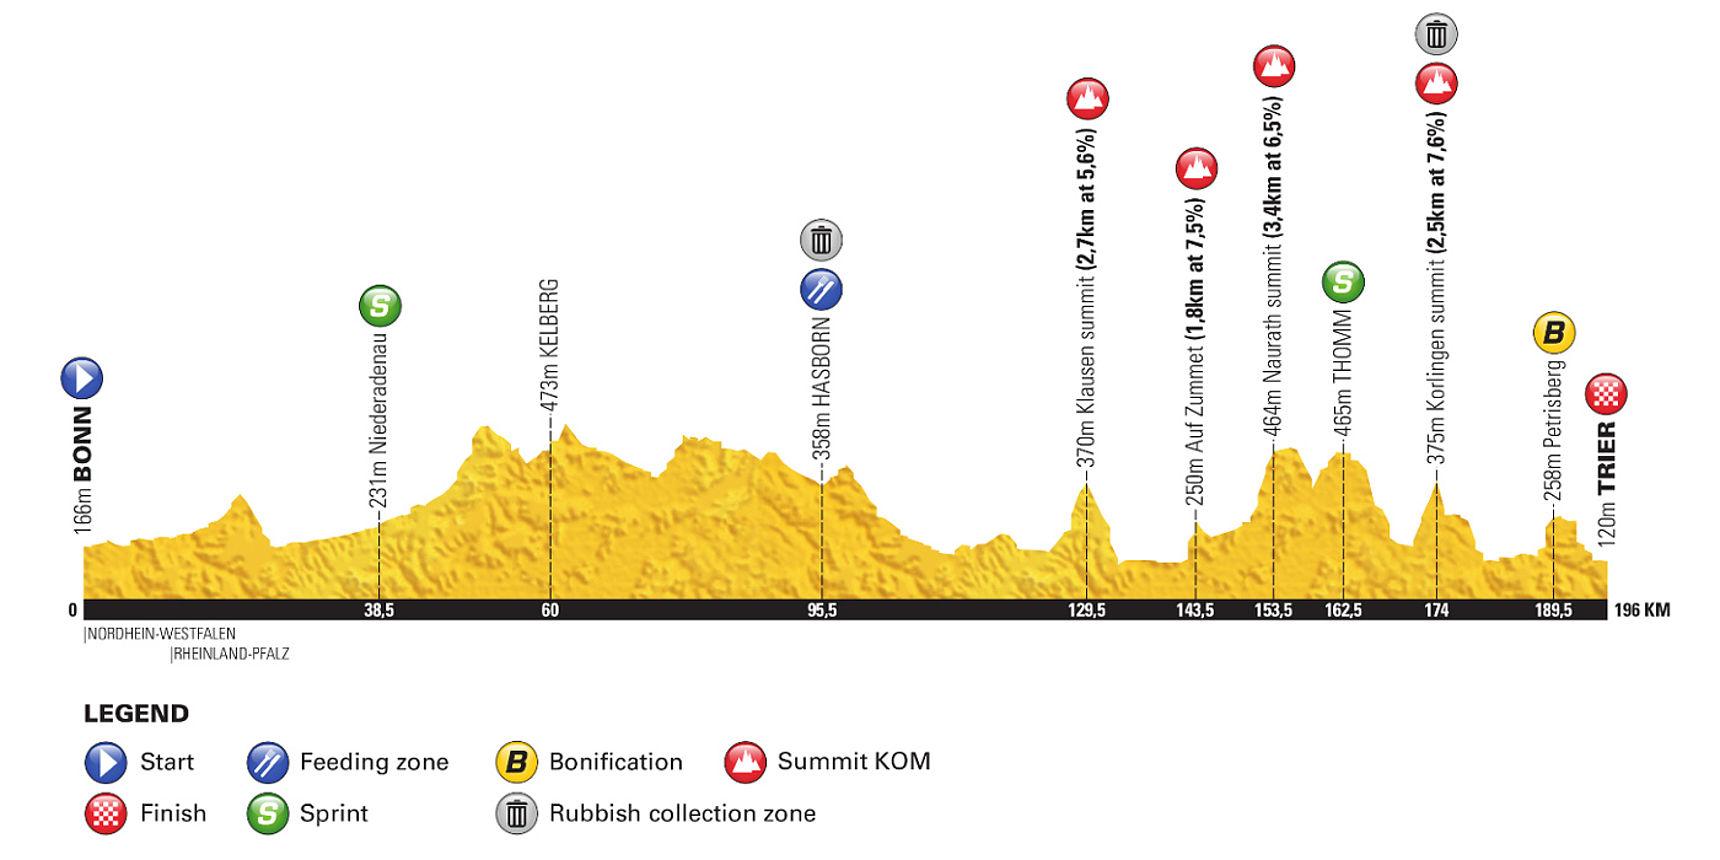 Höhenprofil Deutschland Tour Etappe Bonn Trier